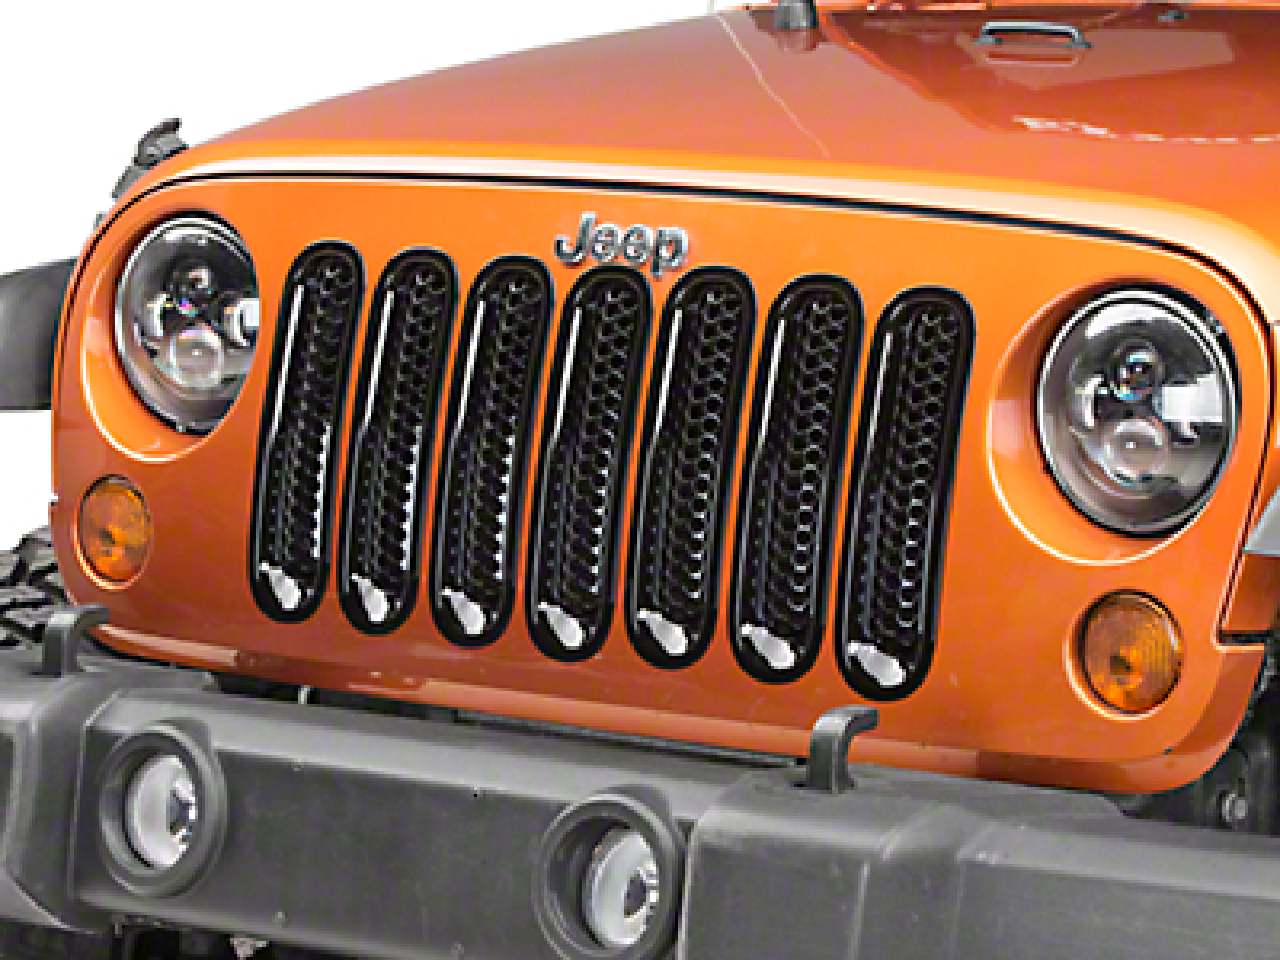 RedRock 4x4 Honeycomb Grille Inserts - Black (07-18 Jeep Wrangler JK)